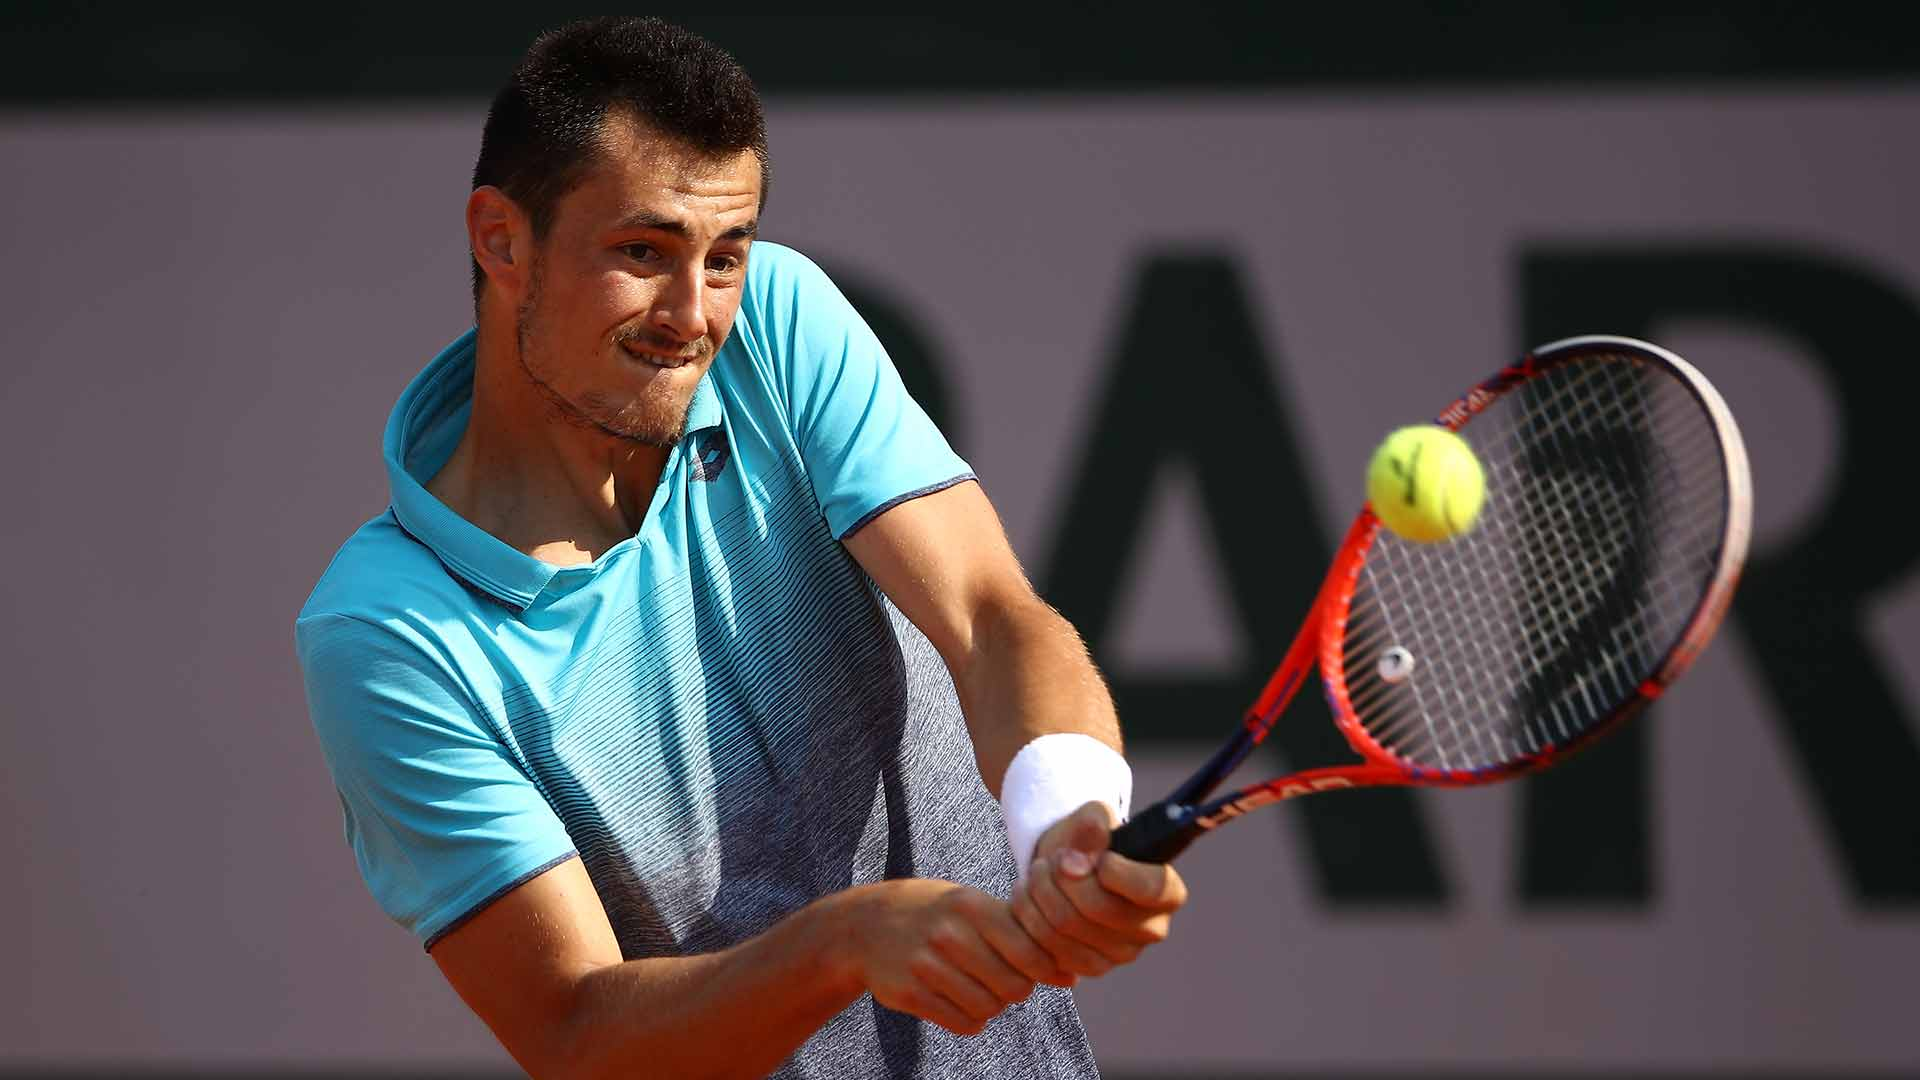 Tomic Into Eighth Consecutive Roland Garros Main Draw Atp Tour